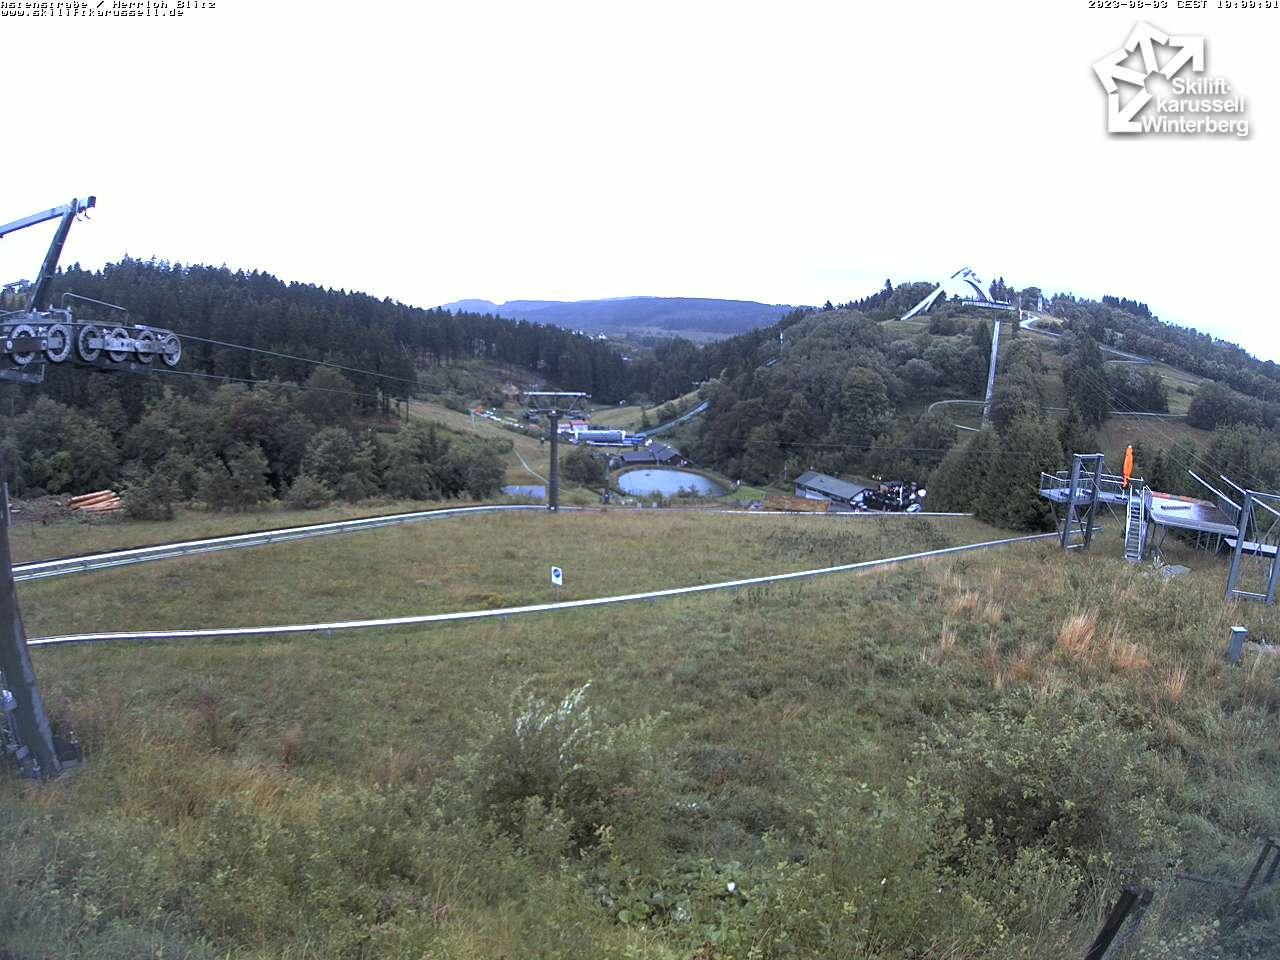 Webcam Astenstraße - Skilifkarussell Winterberg